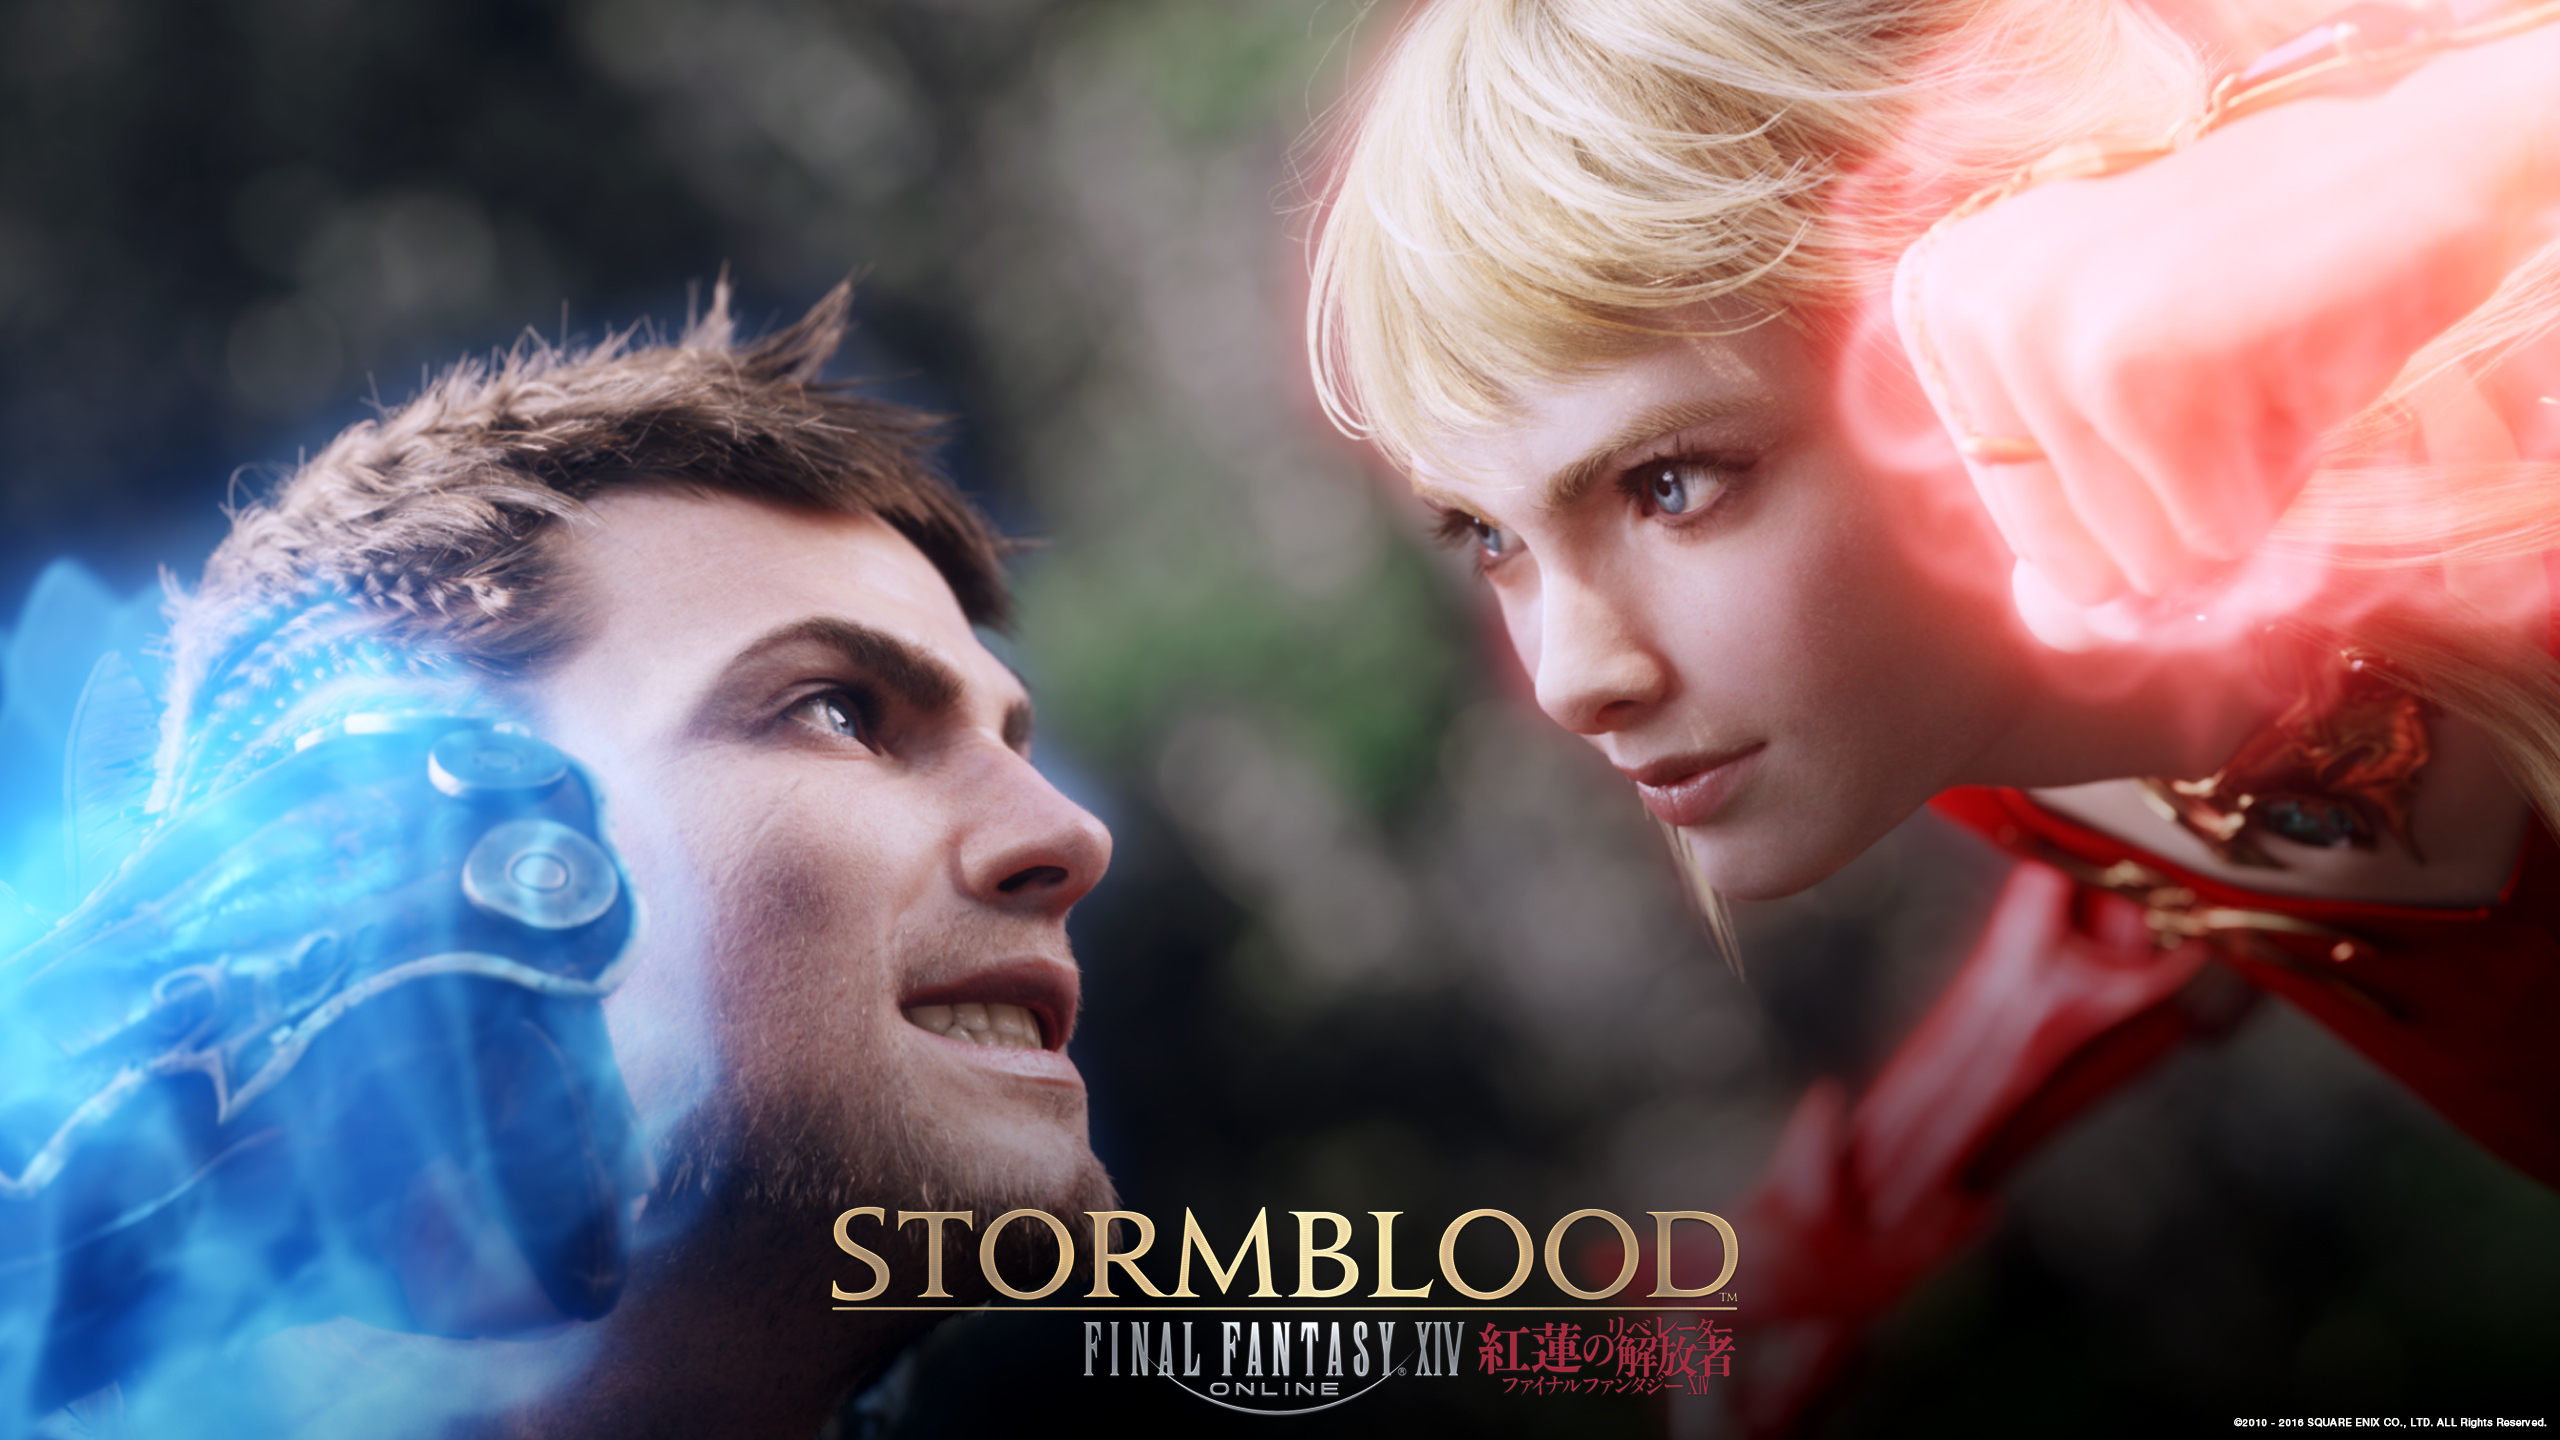 FINAL FANTASY XIV Stormblood Coming Early Summer 2017